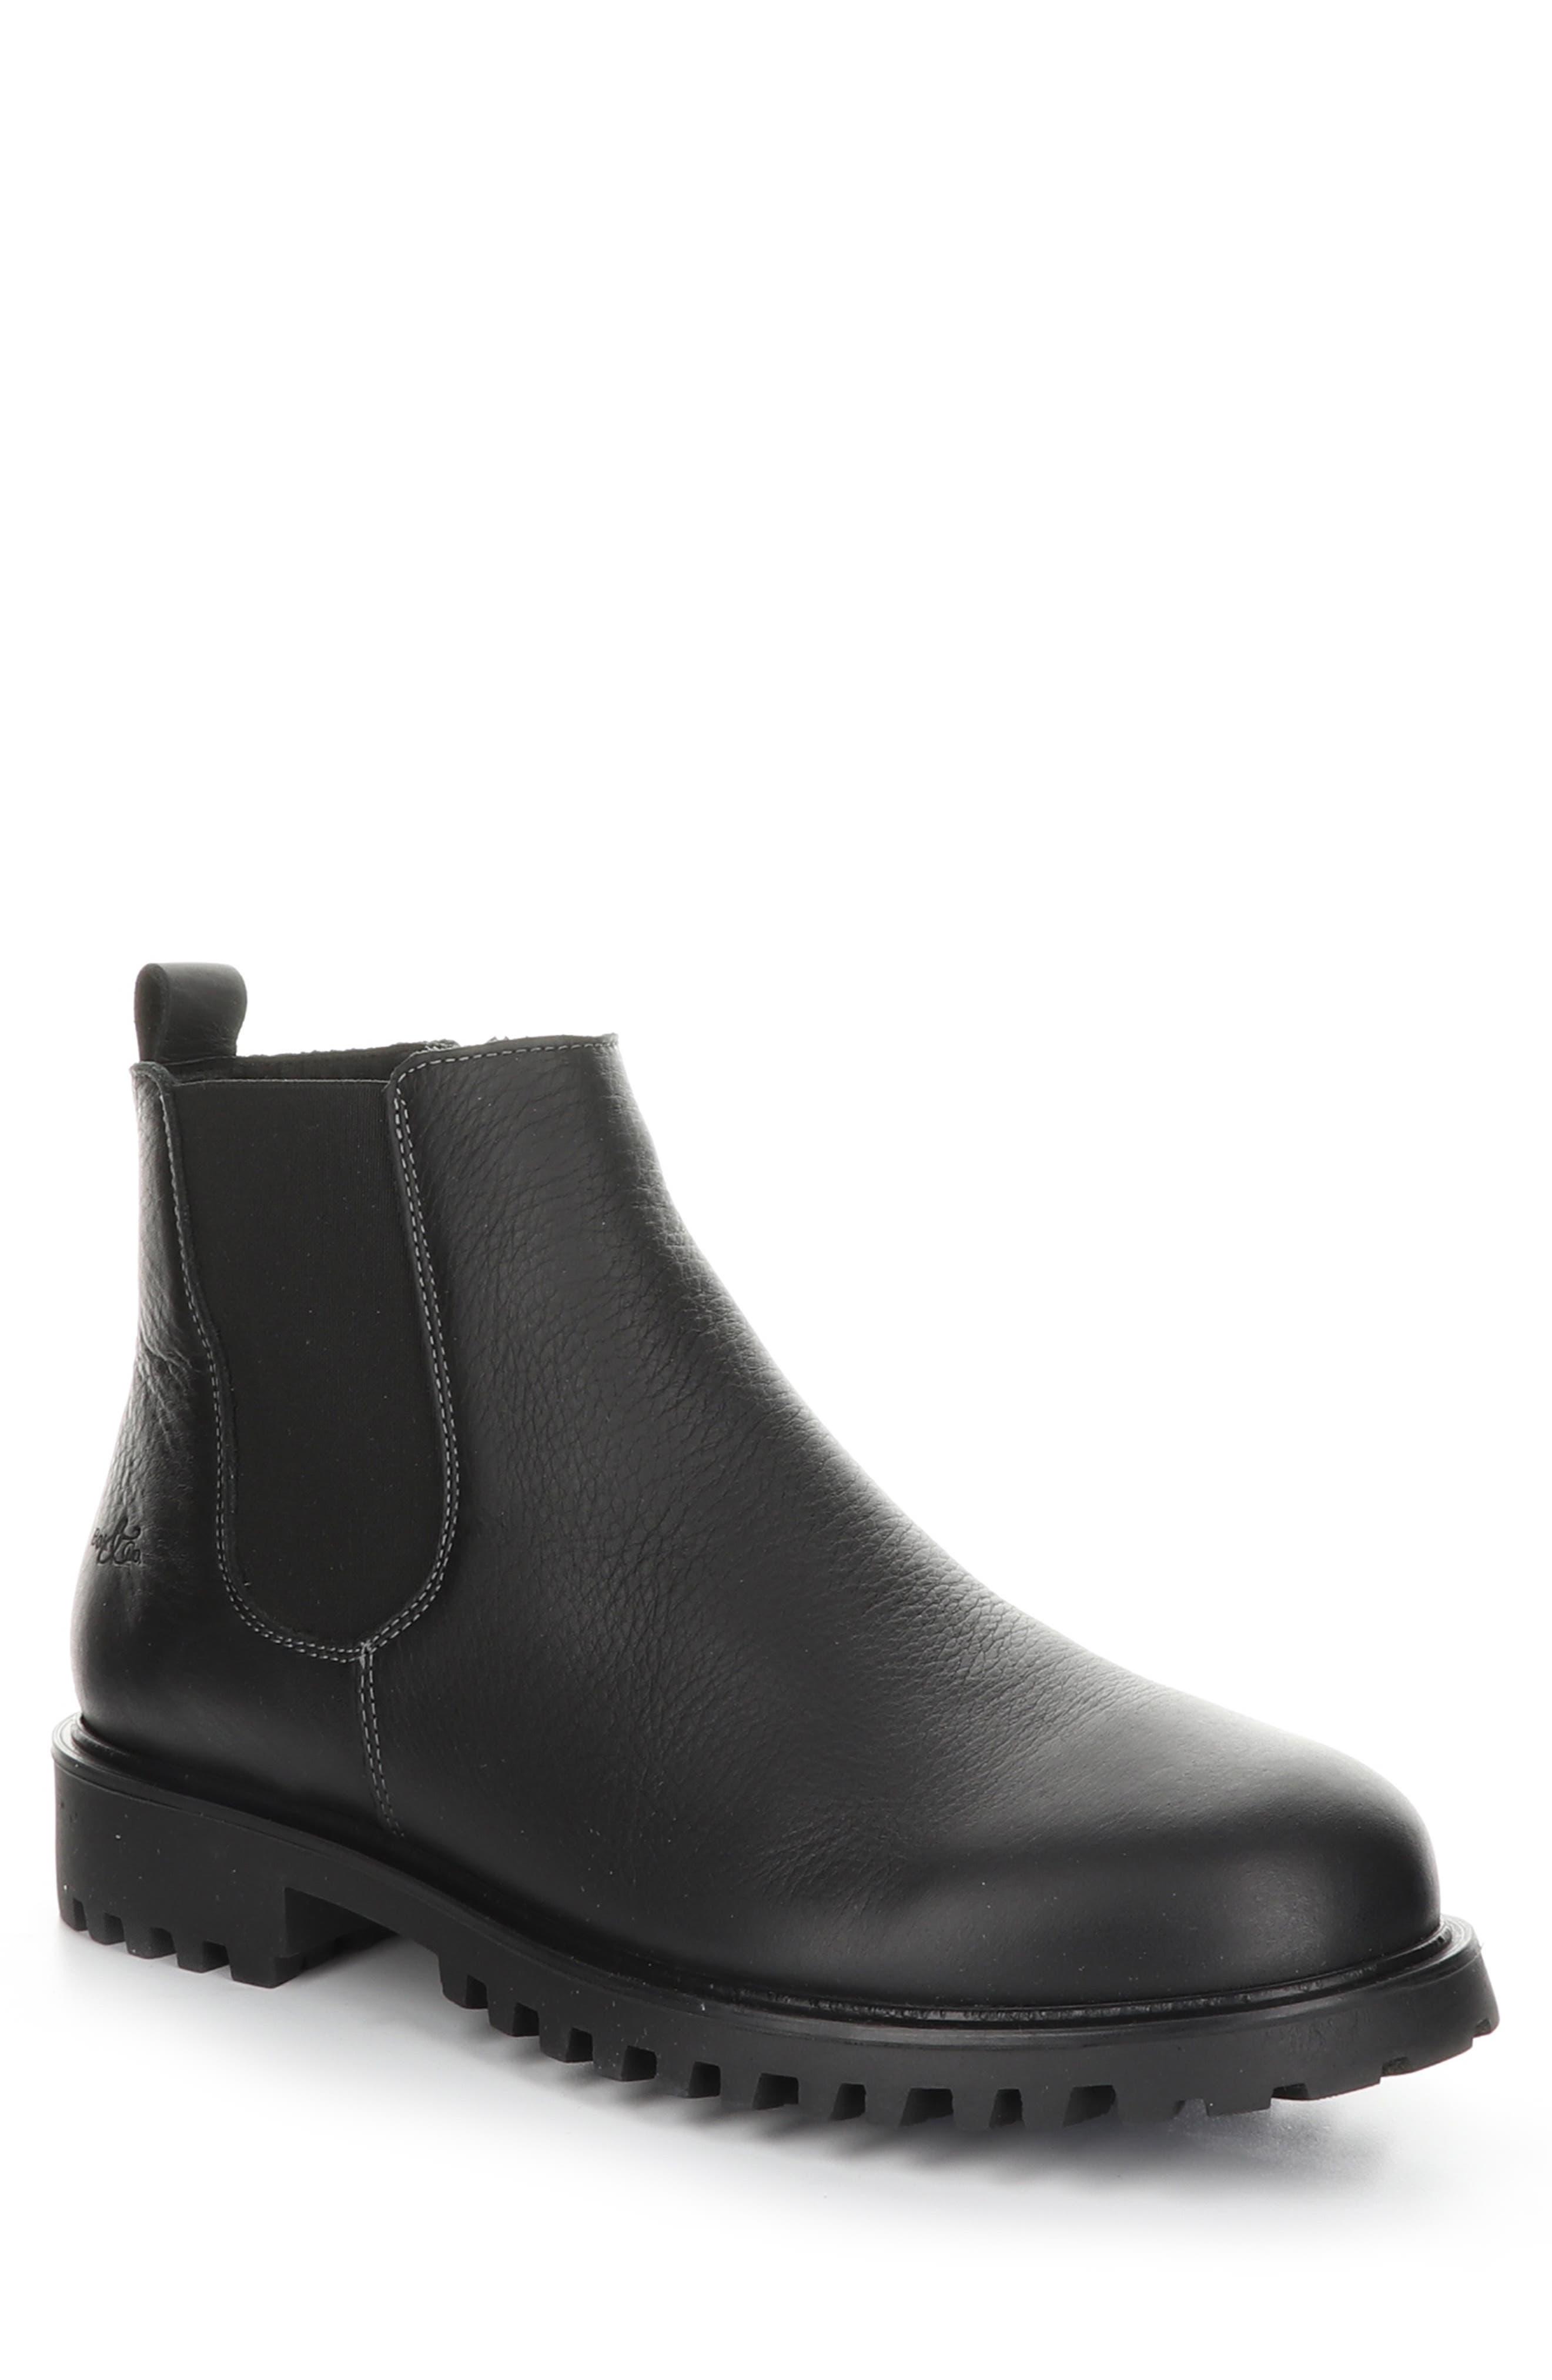 Dax Waterproof Chelsea Boot